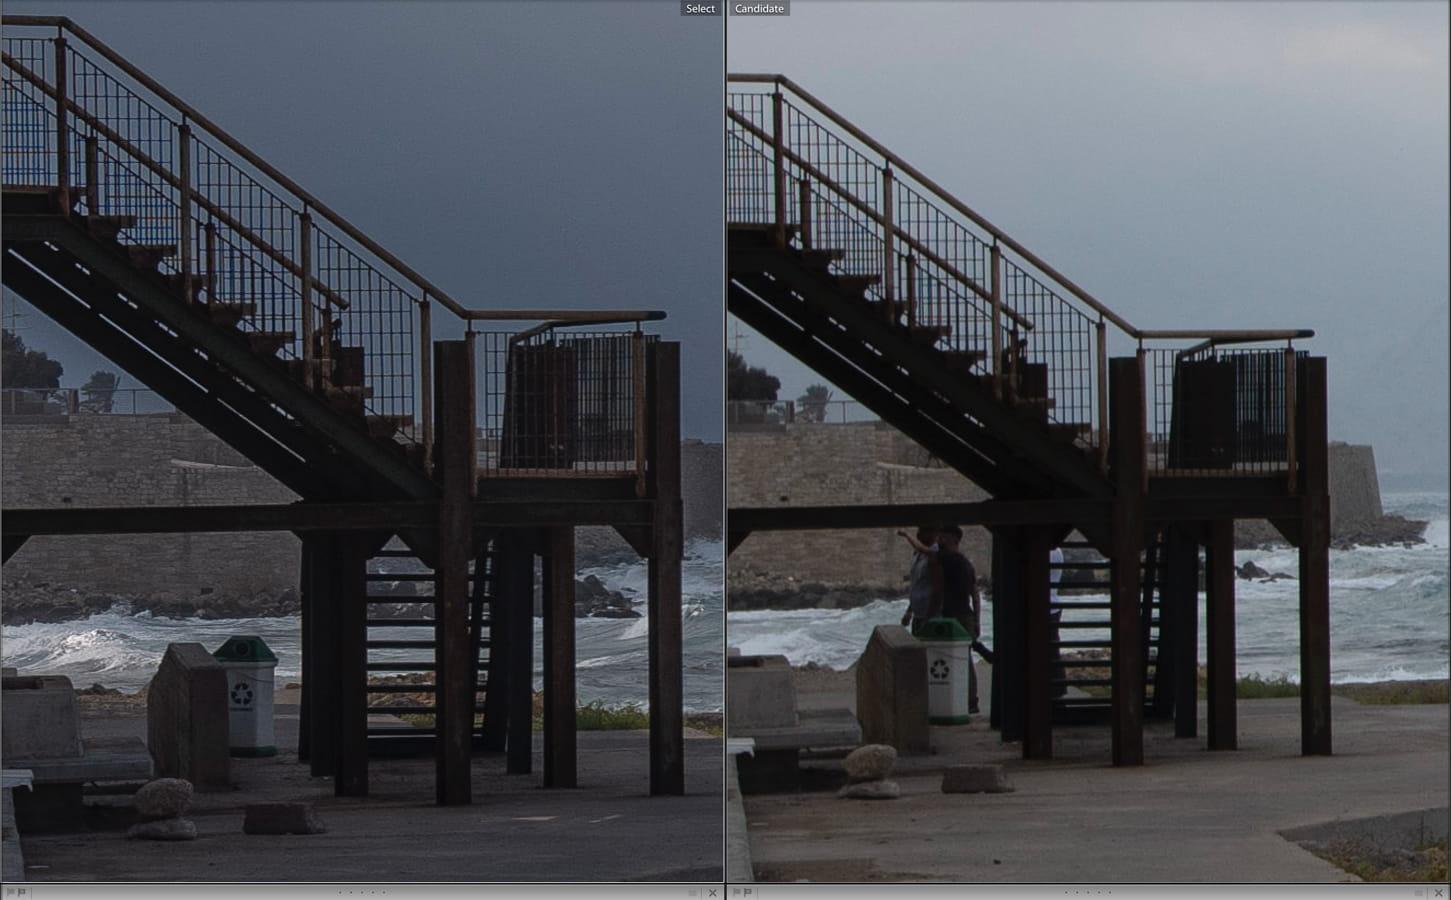 image quality test day 3 Nikon 14-24 vs Fuji 32-64